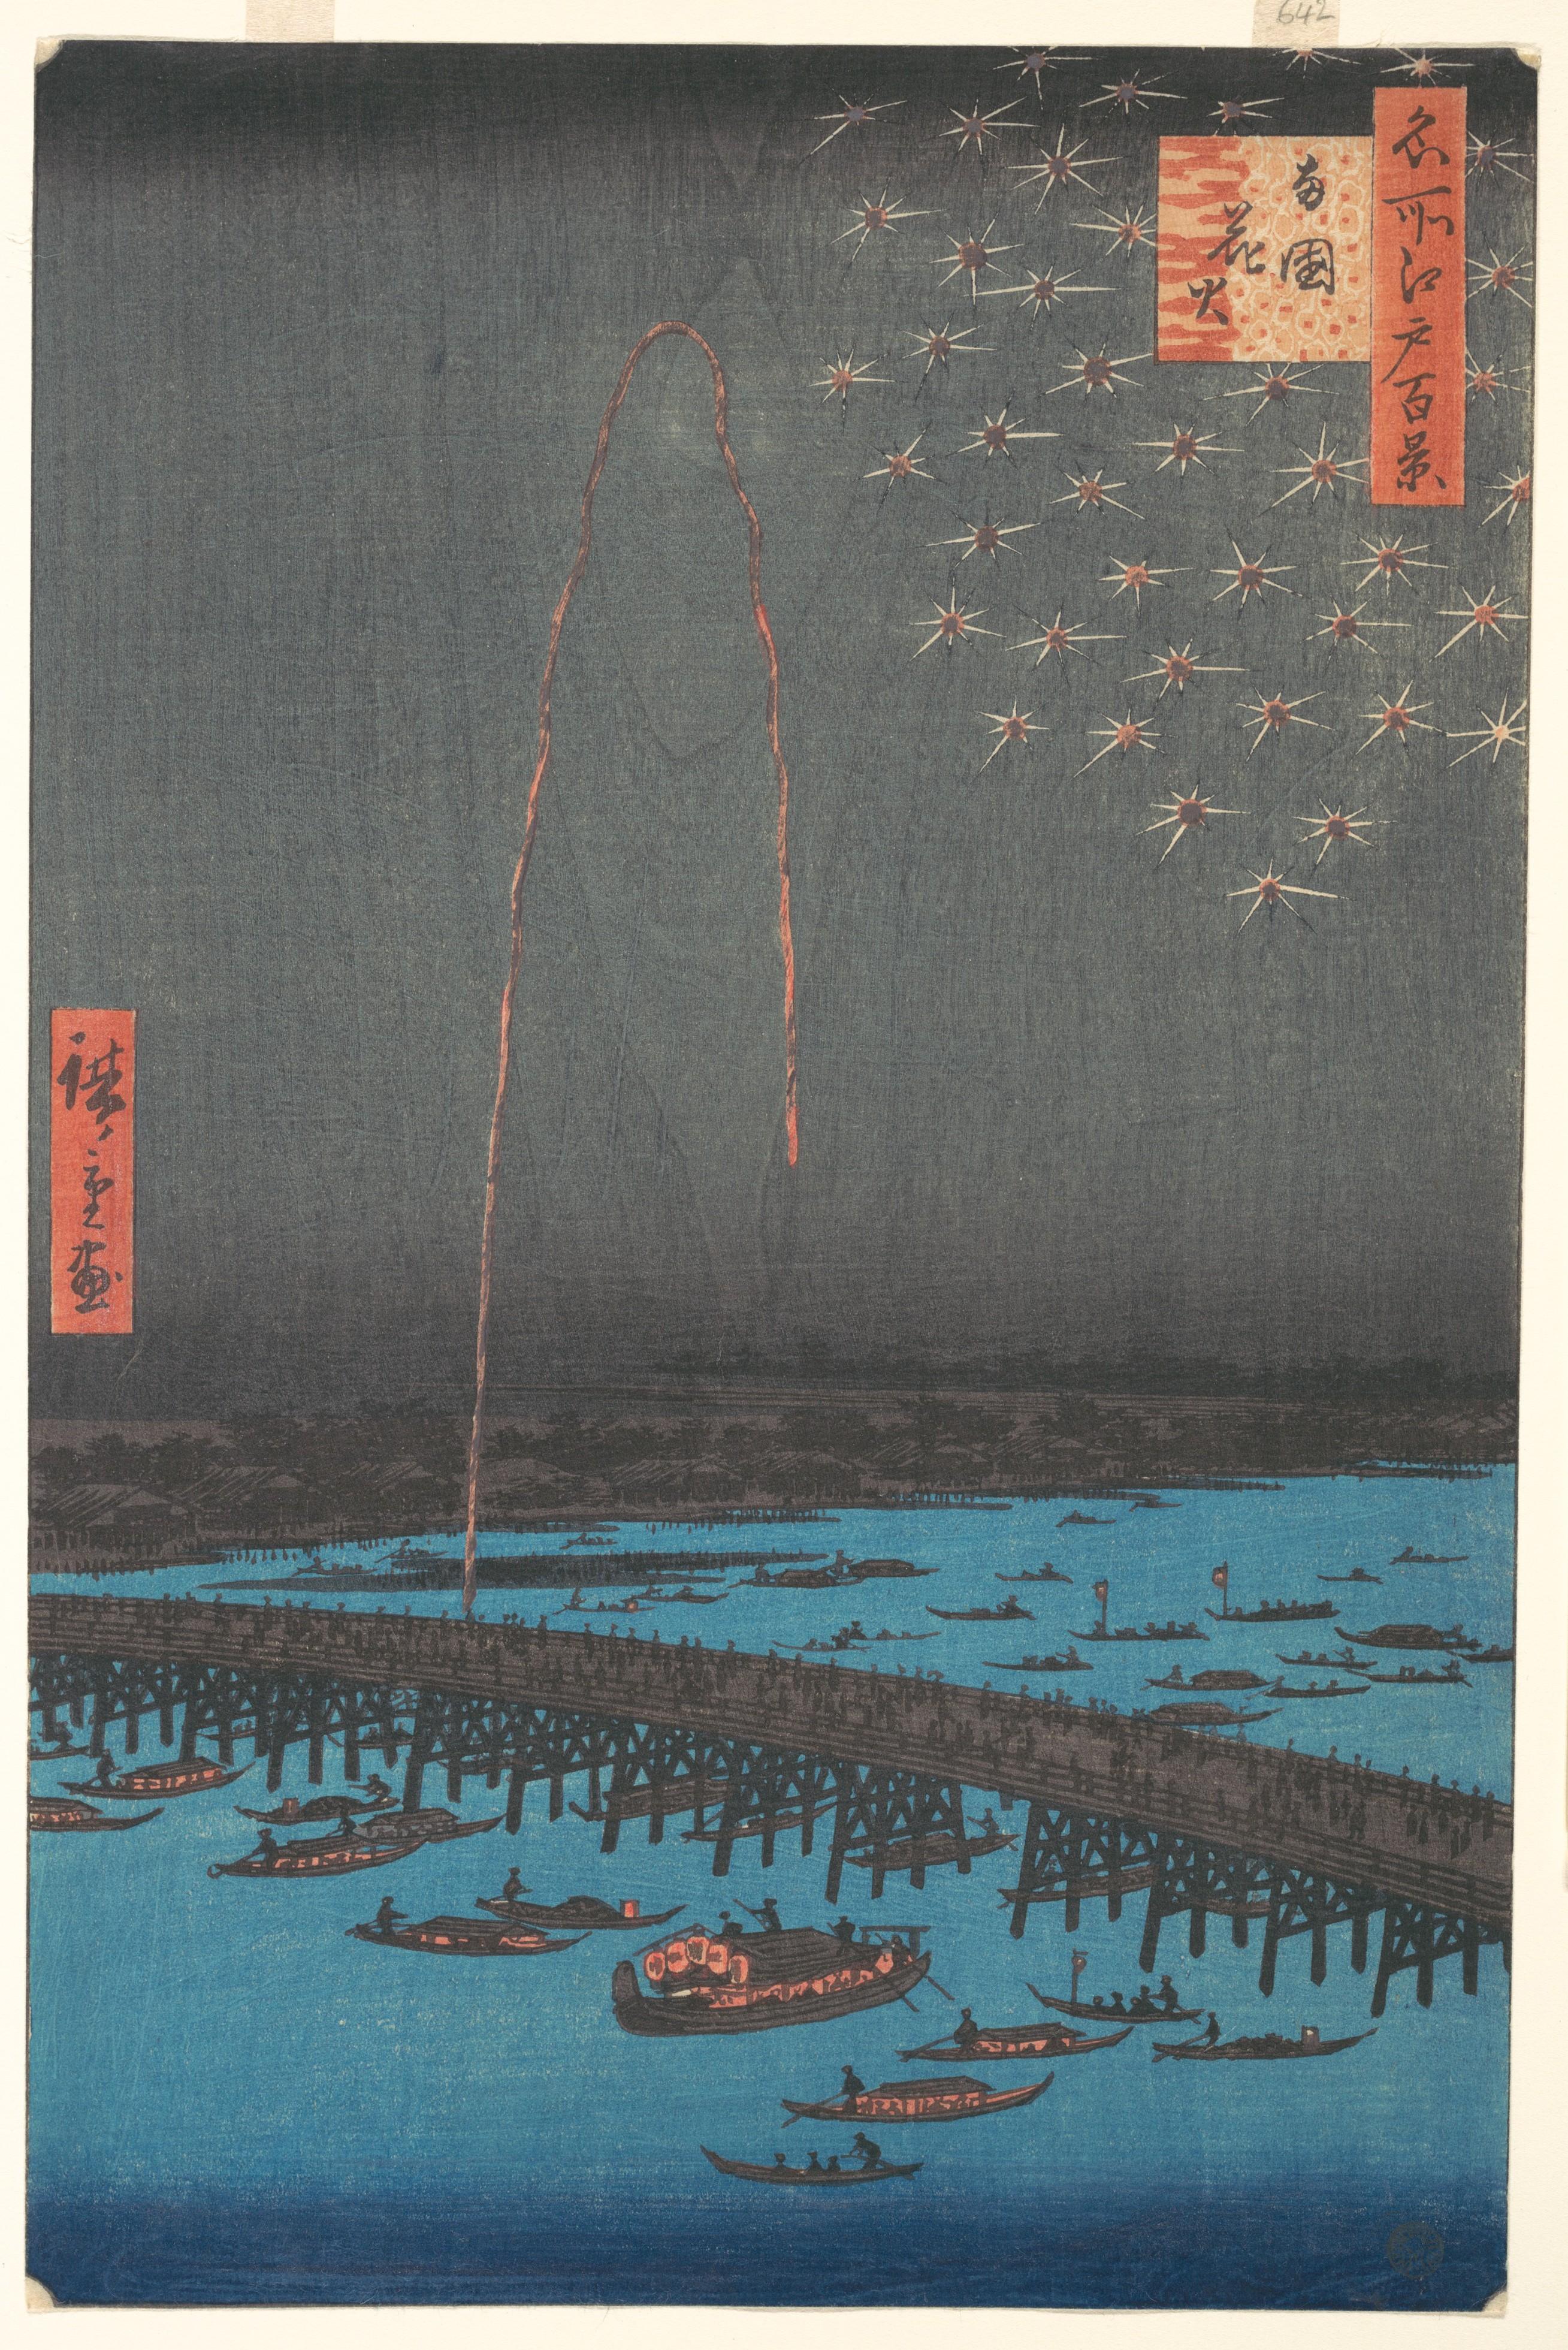 Utagawa Hiroshige | Fireworks at Ryōgoku Bridge, from the